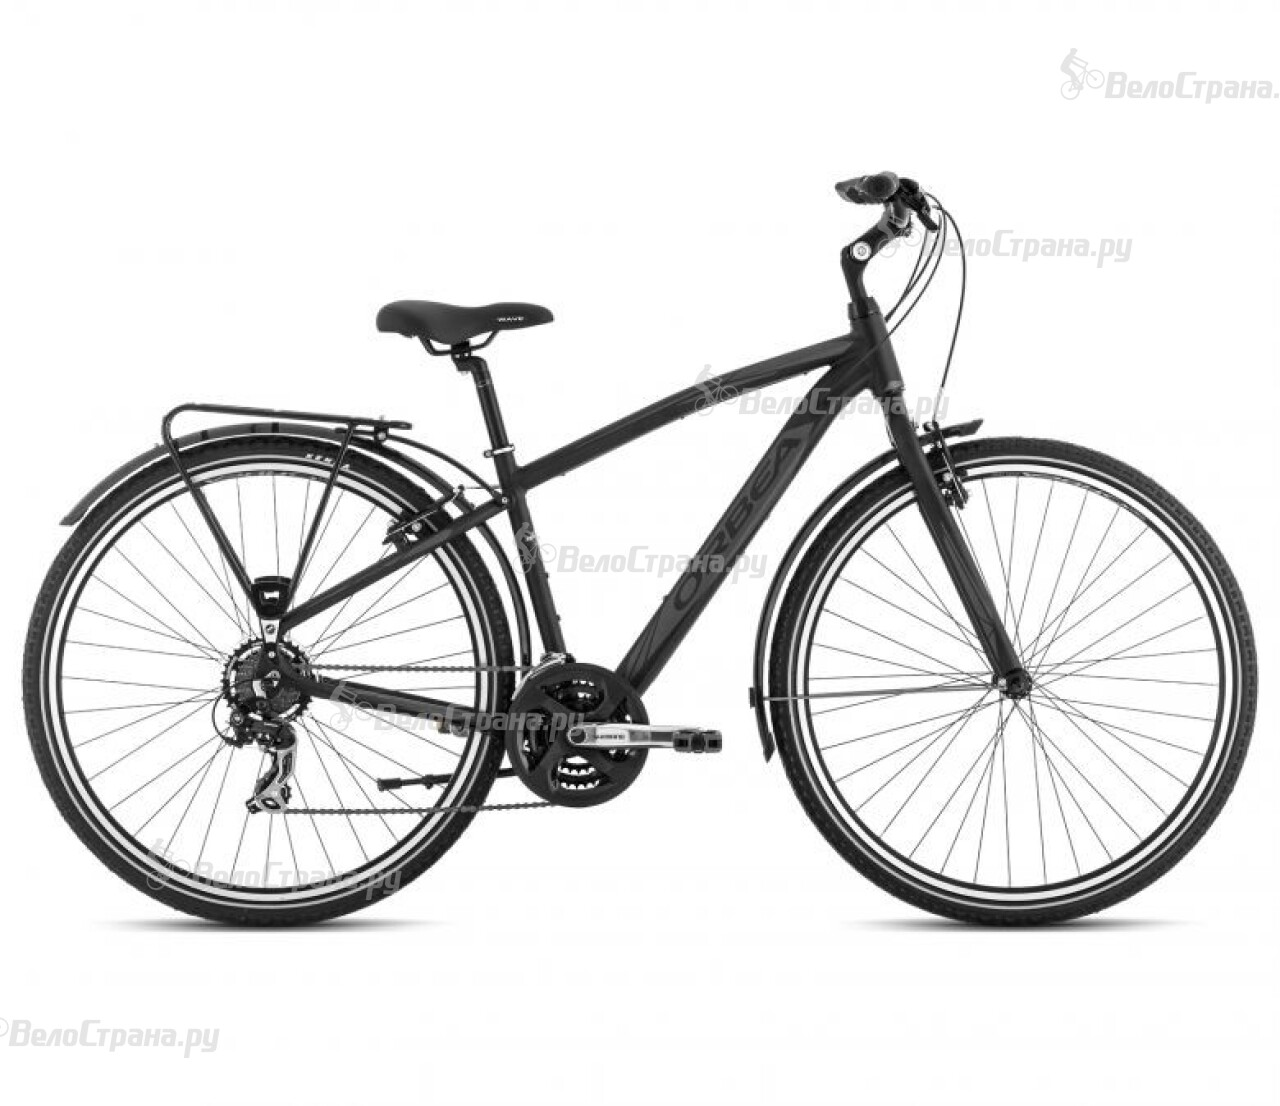 Велосипед Orbea Comfort 28 30 Equiped (2014) comfort 30